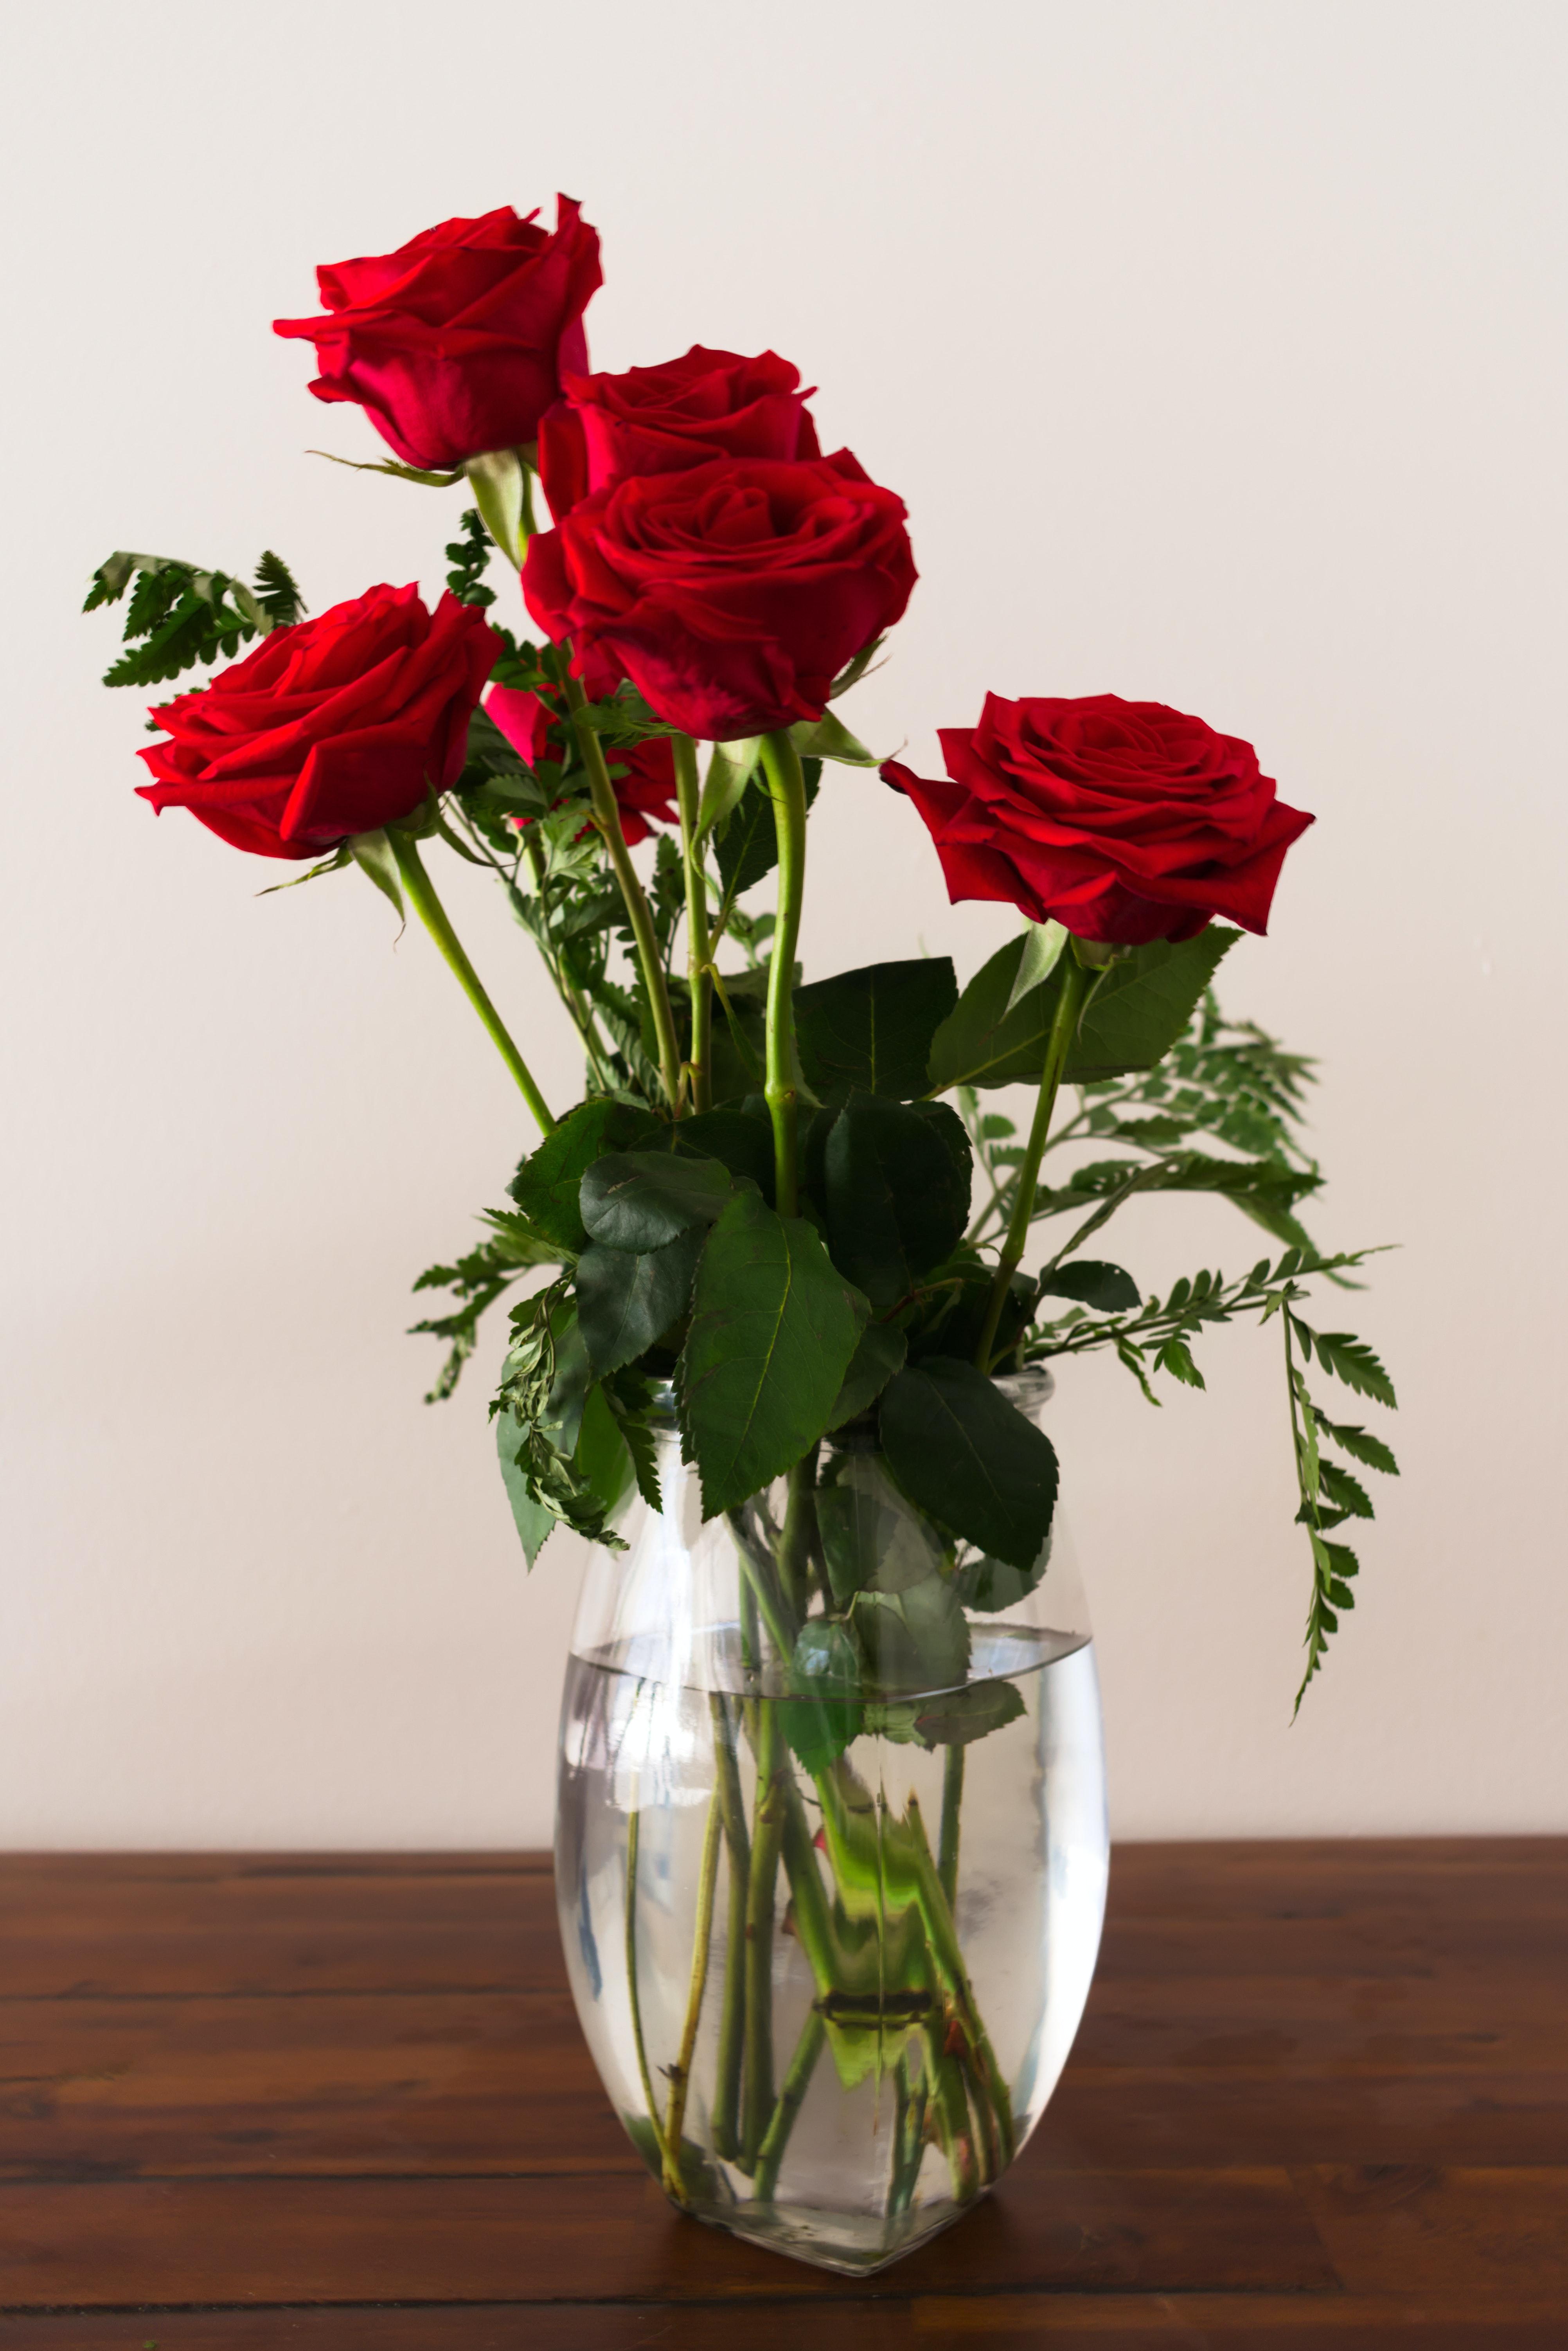 Pexels & 1000+ Interesting Flower Vase Photos · Pexels · Free Stock Photos